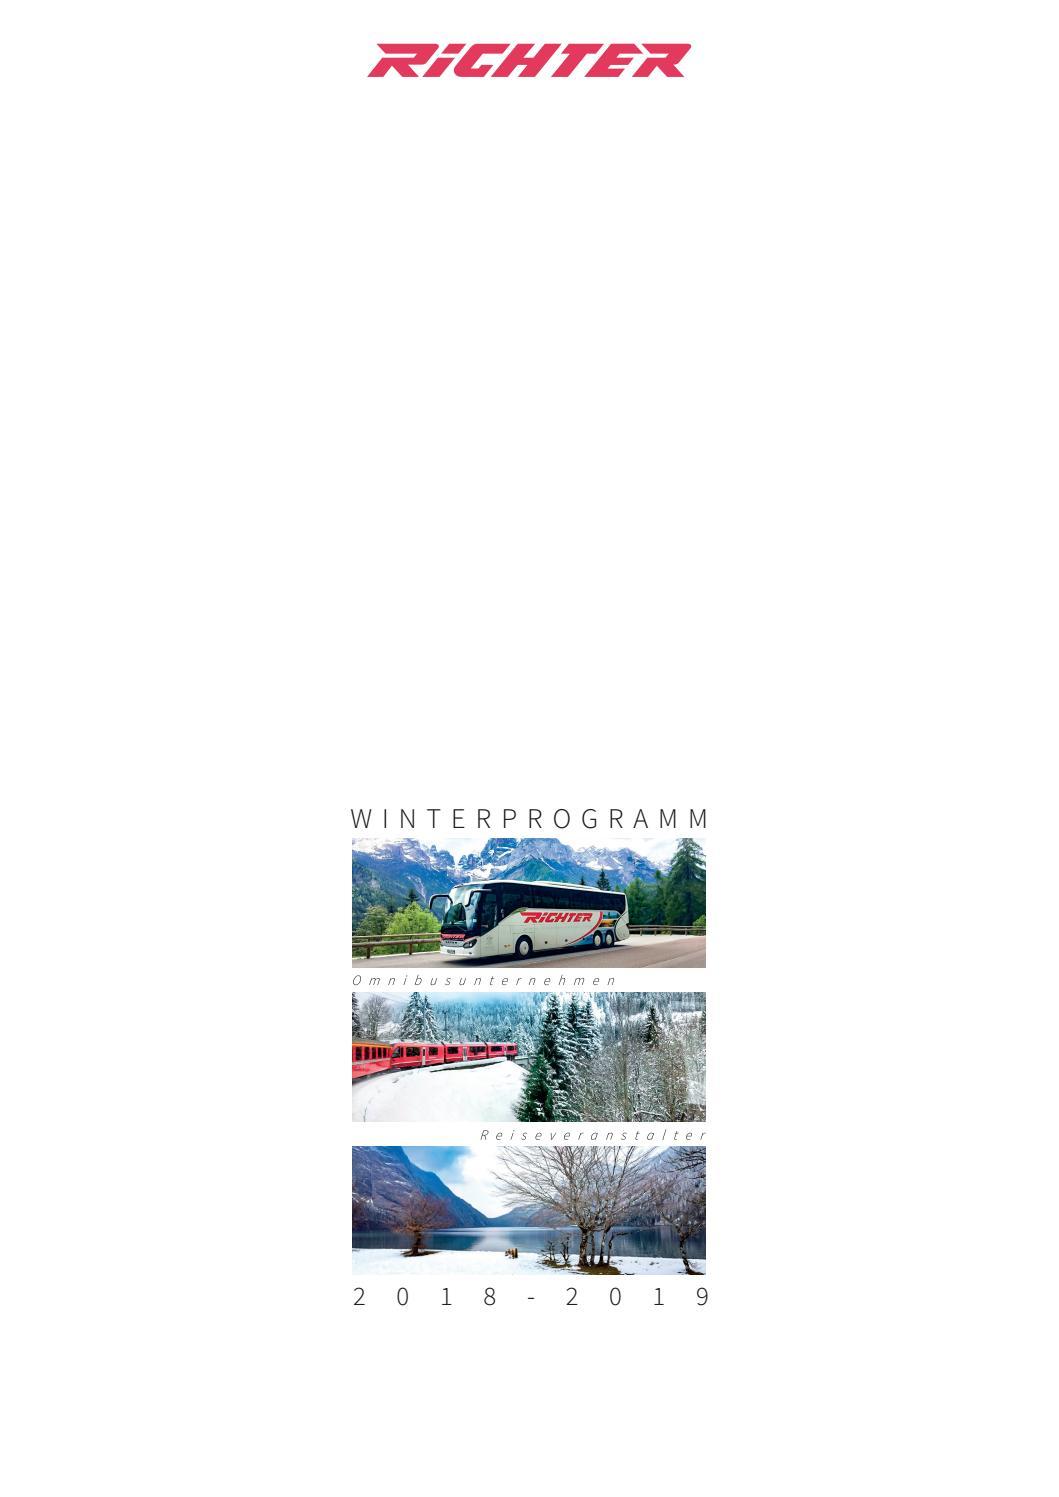 Richter Reisen Winterkatalog 2018-2019 by Frank Jaskiela - issuu